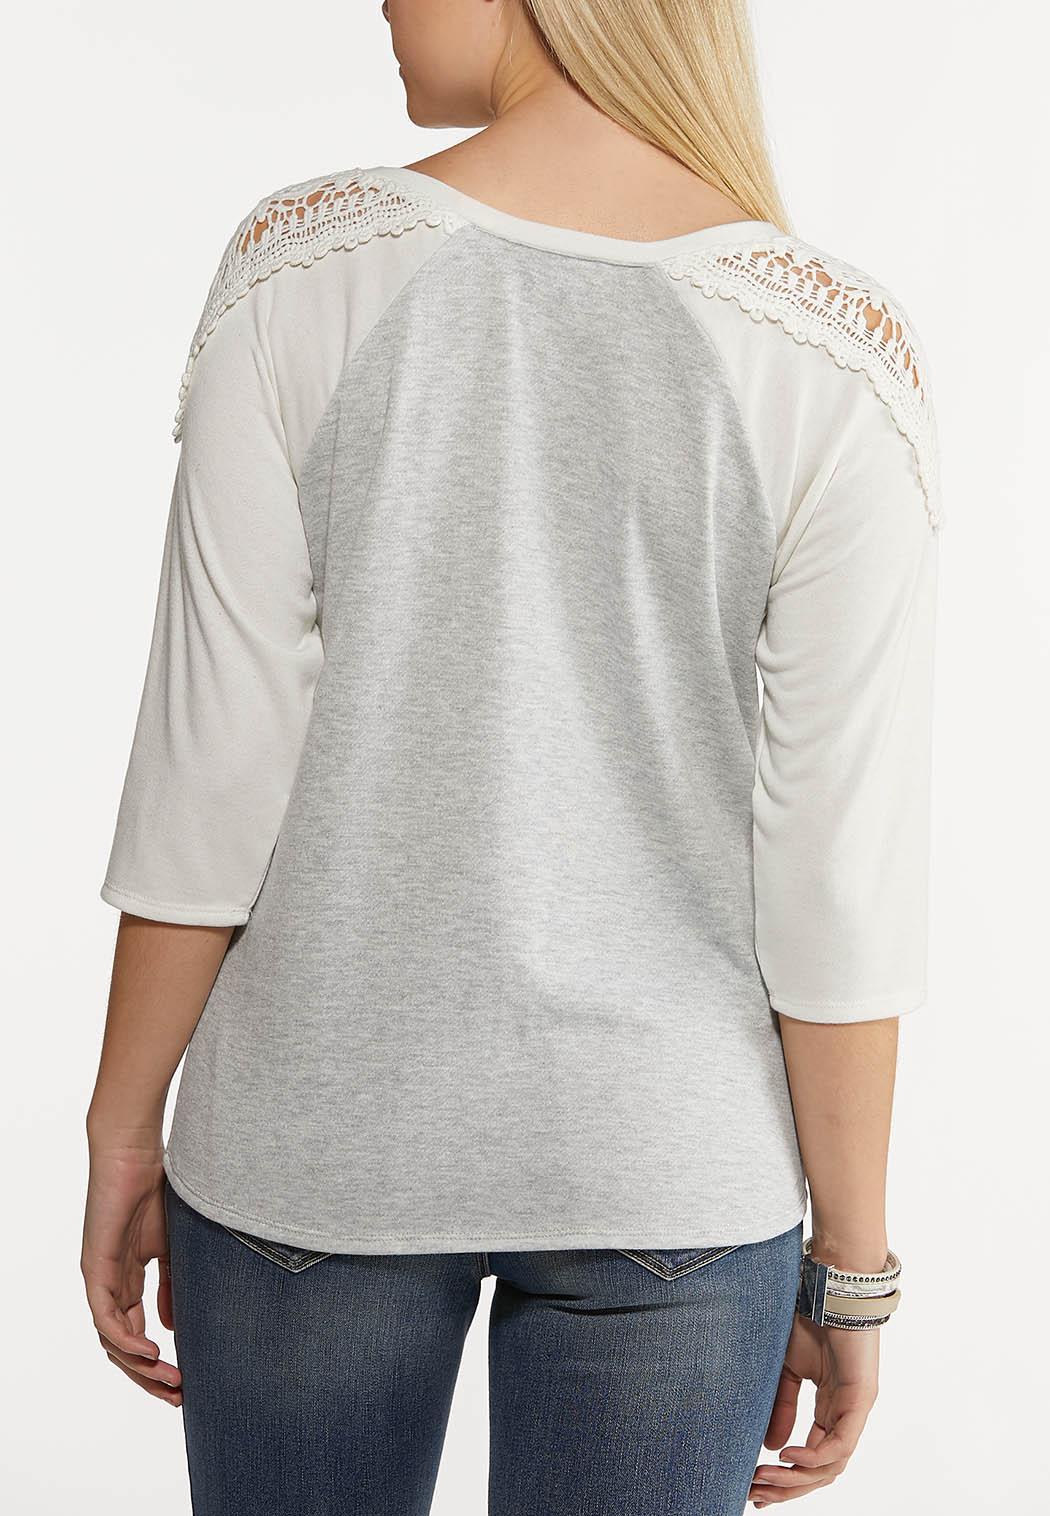 Sporty Lace Trim Top (Item #44204833)